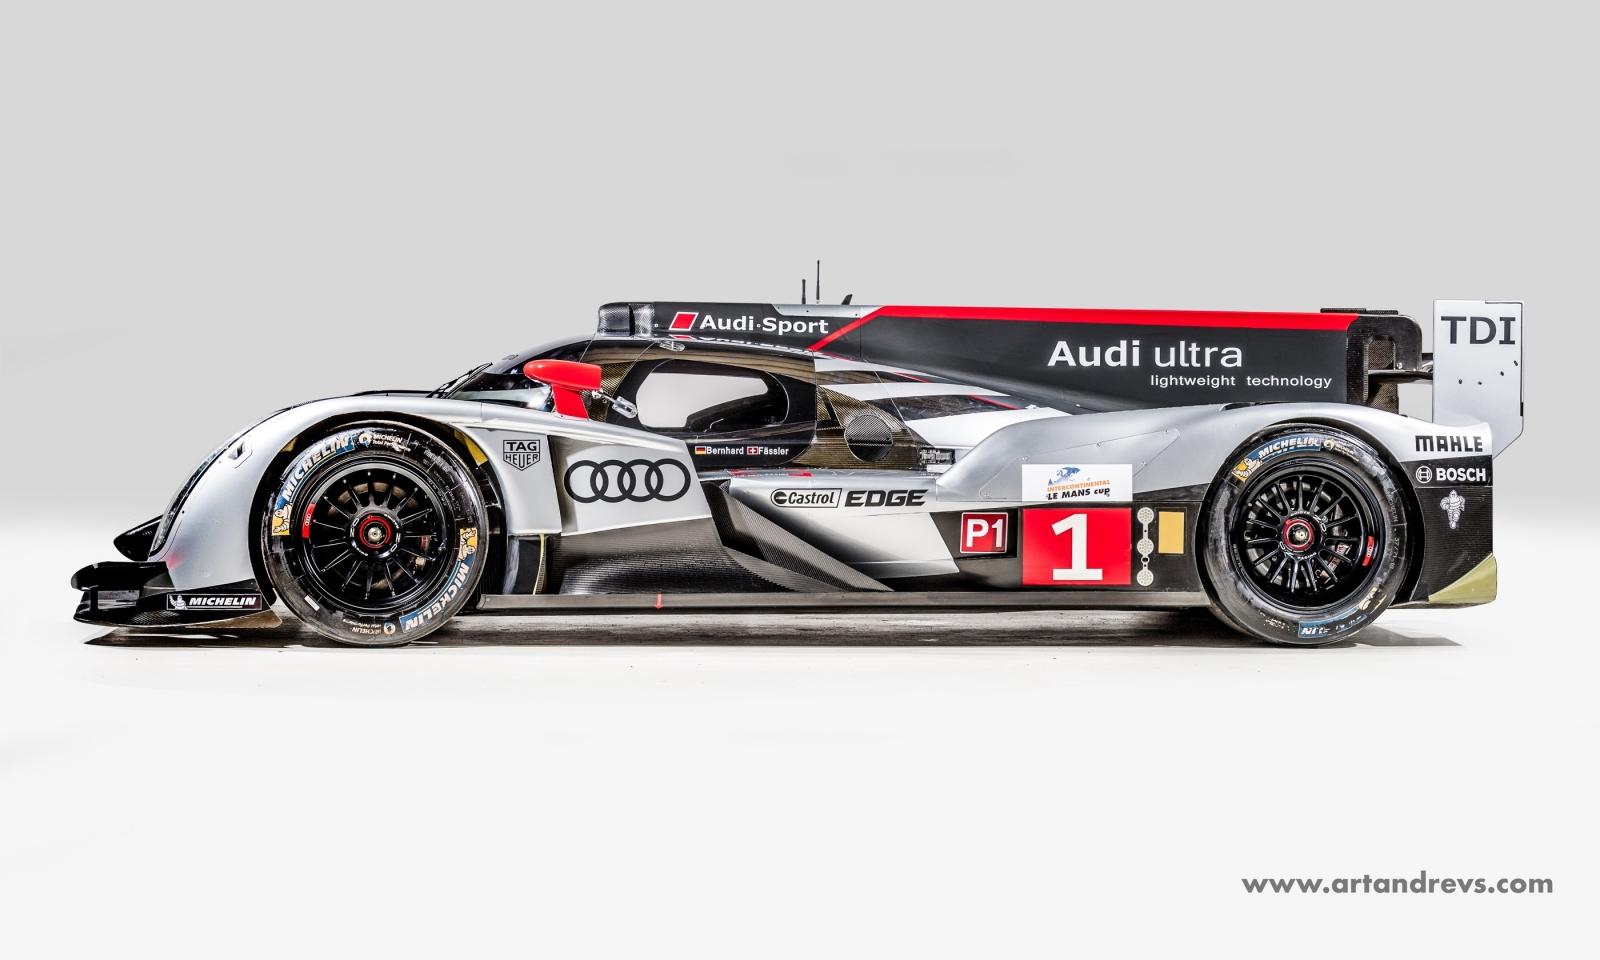 Une Audi R18 TDI ultra disponible… - Endurance-Info